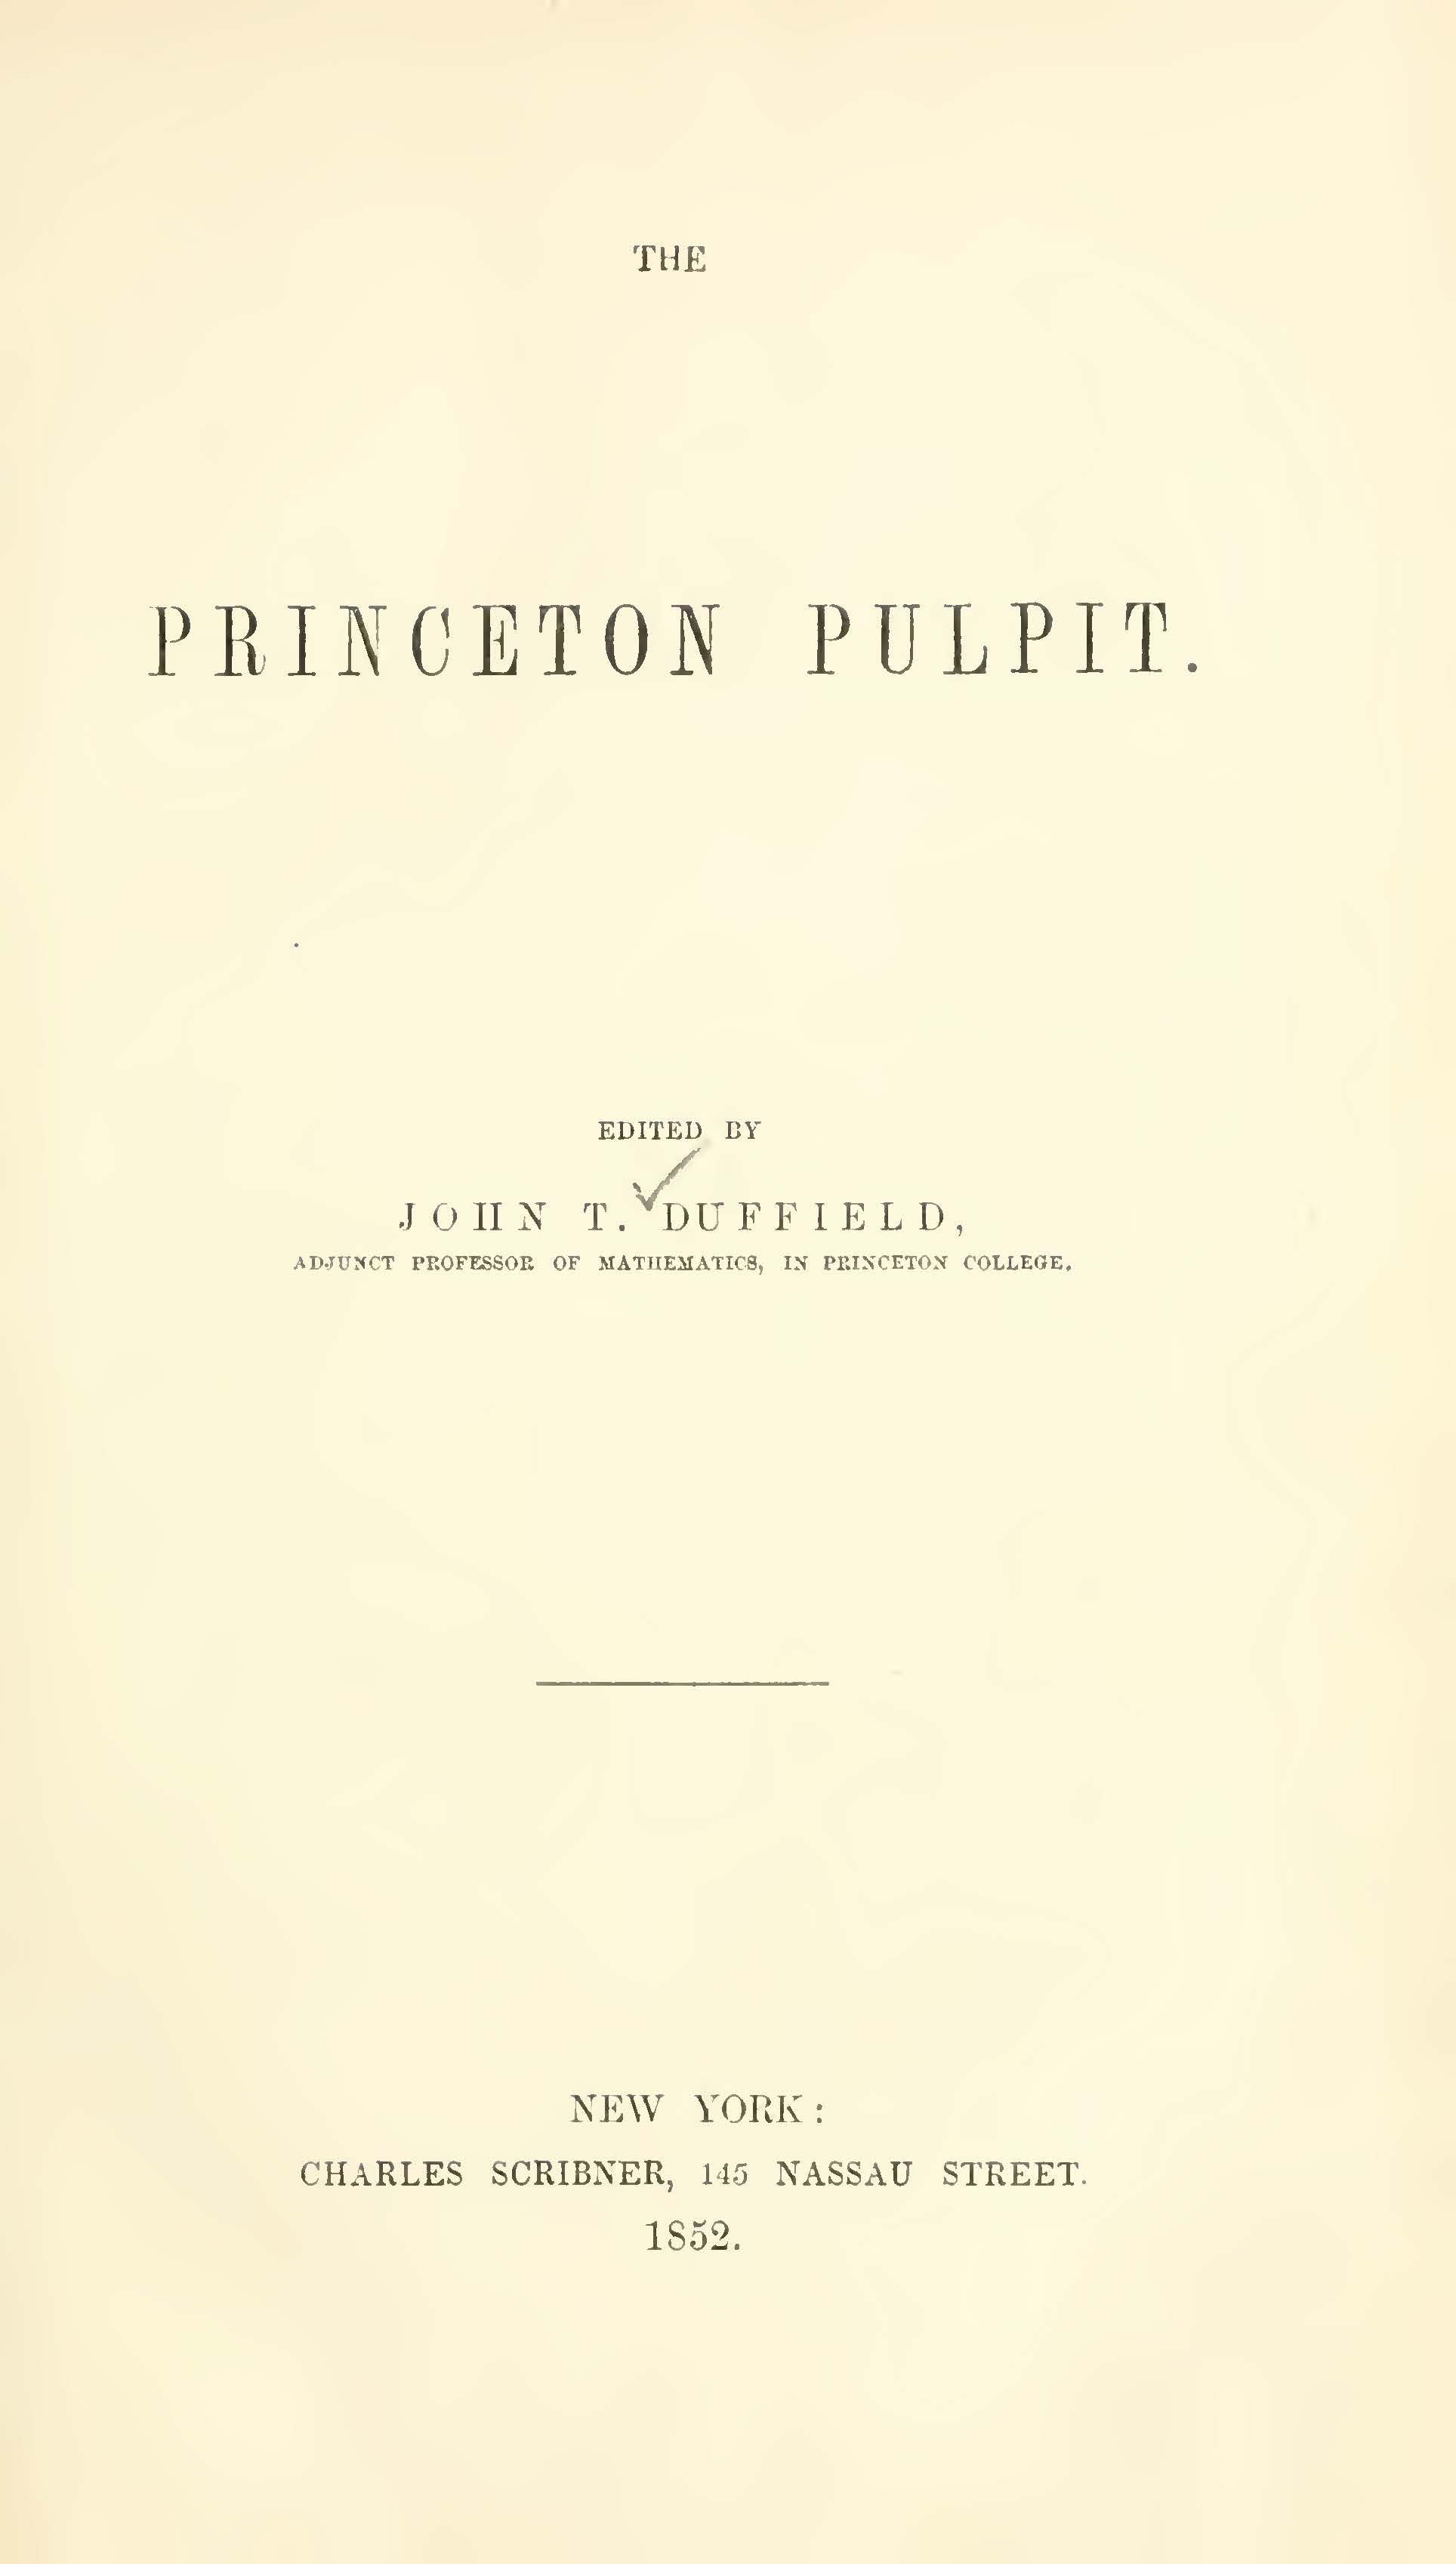 Duffield, John Thomas, The Princeton Pulpit Title Page.jpg